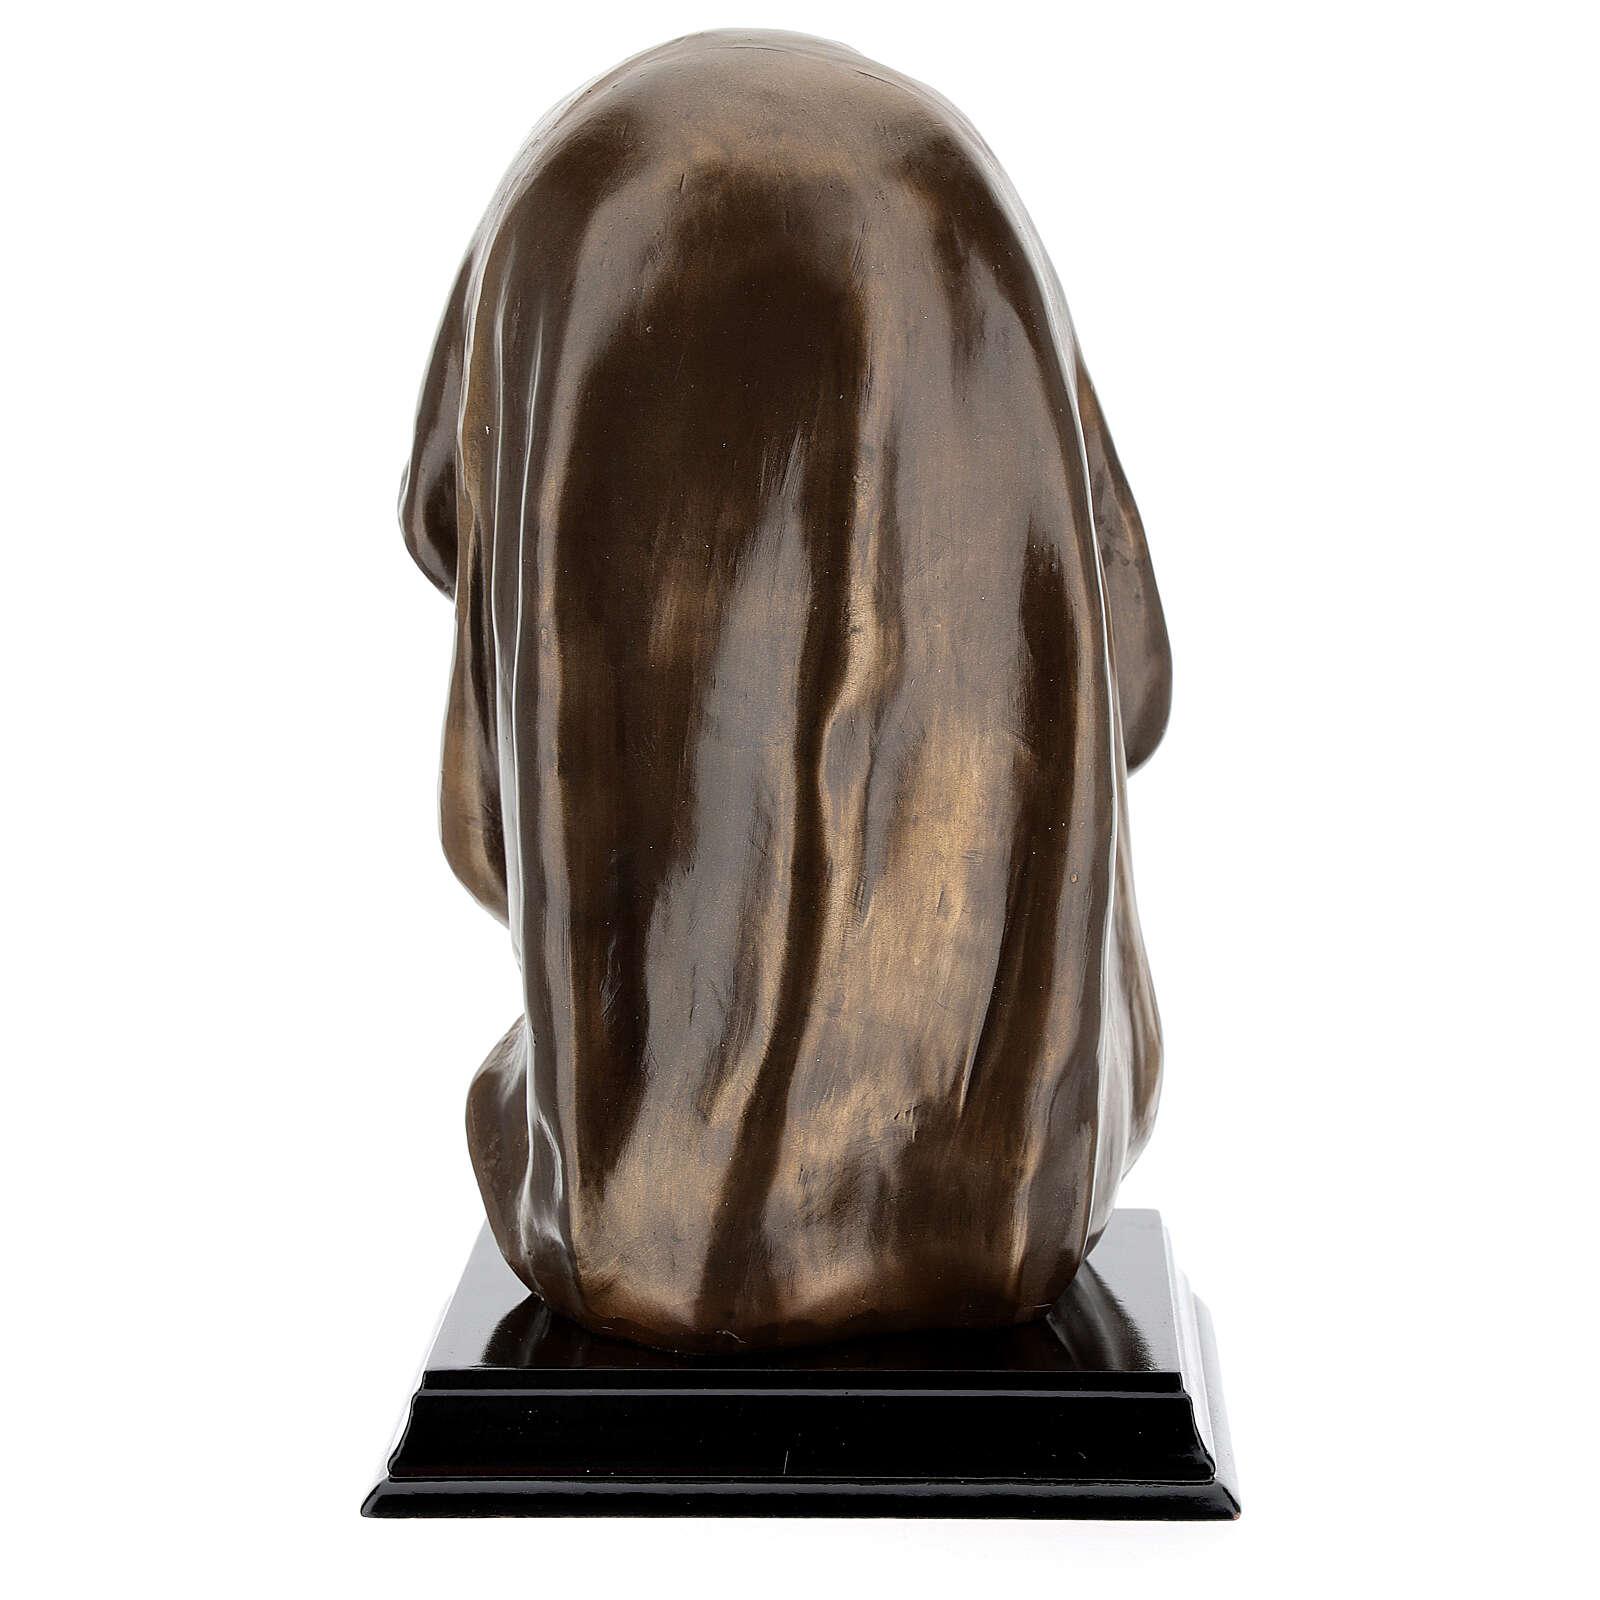 Rosto Virgem Maria resina efeito bronzeado 18x11,5 cm 4